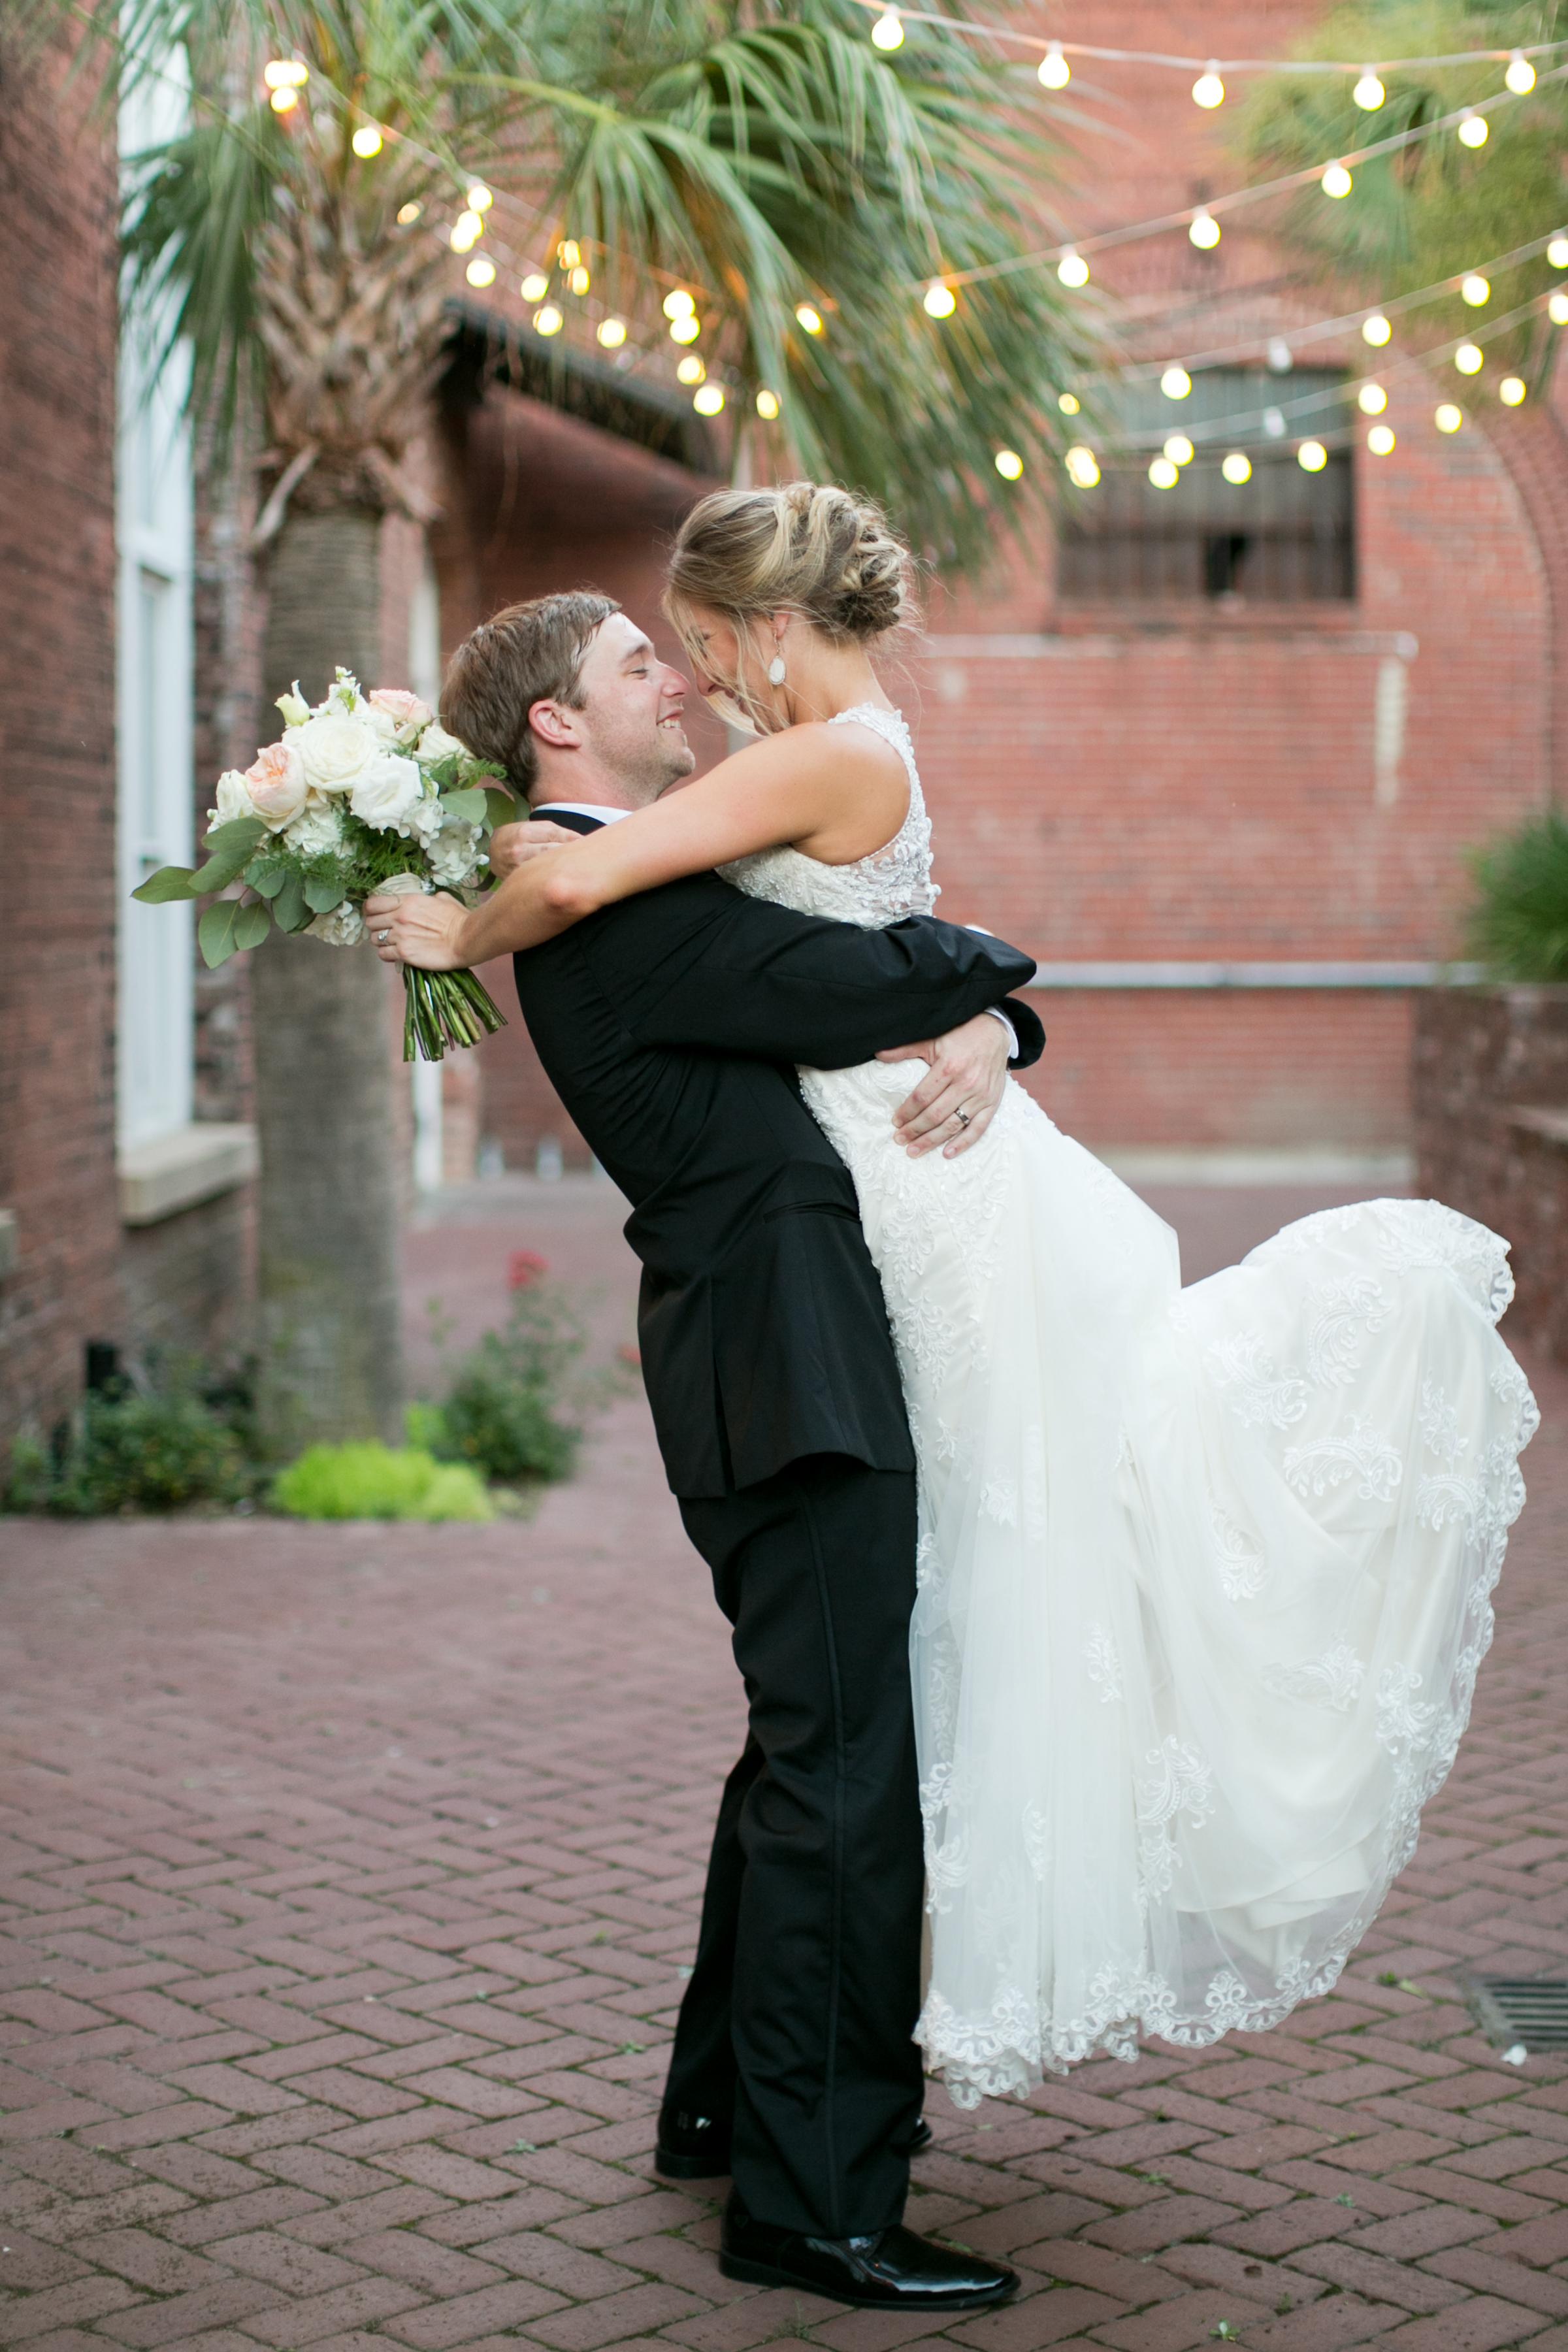 701_whaley_wedding_49.jpg